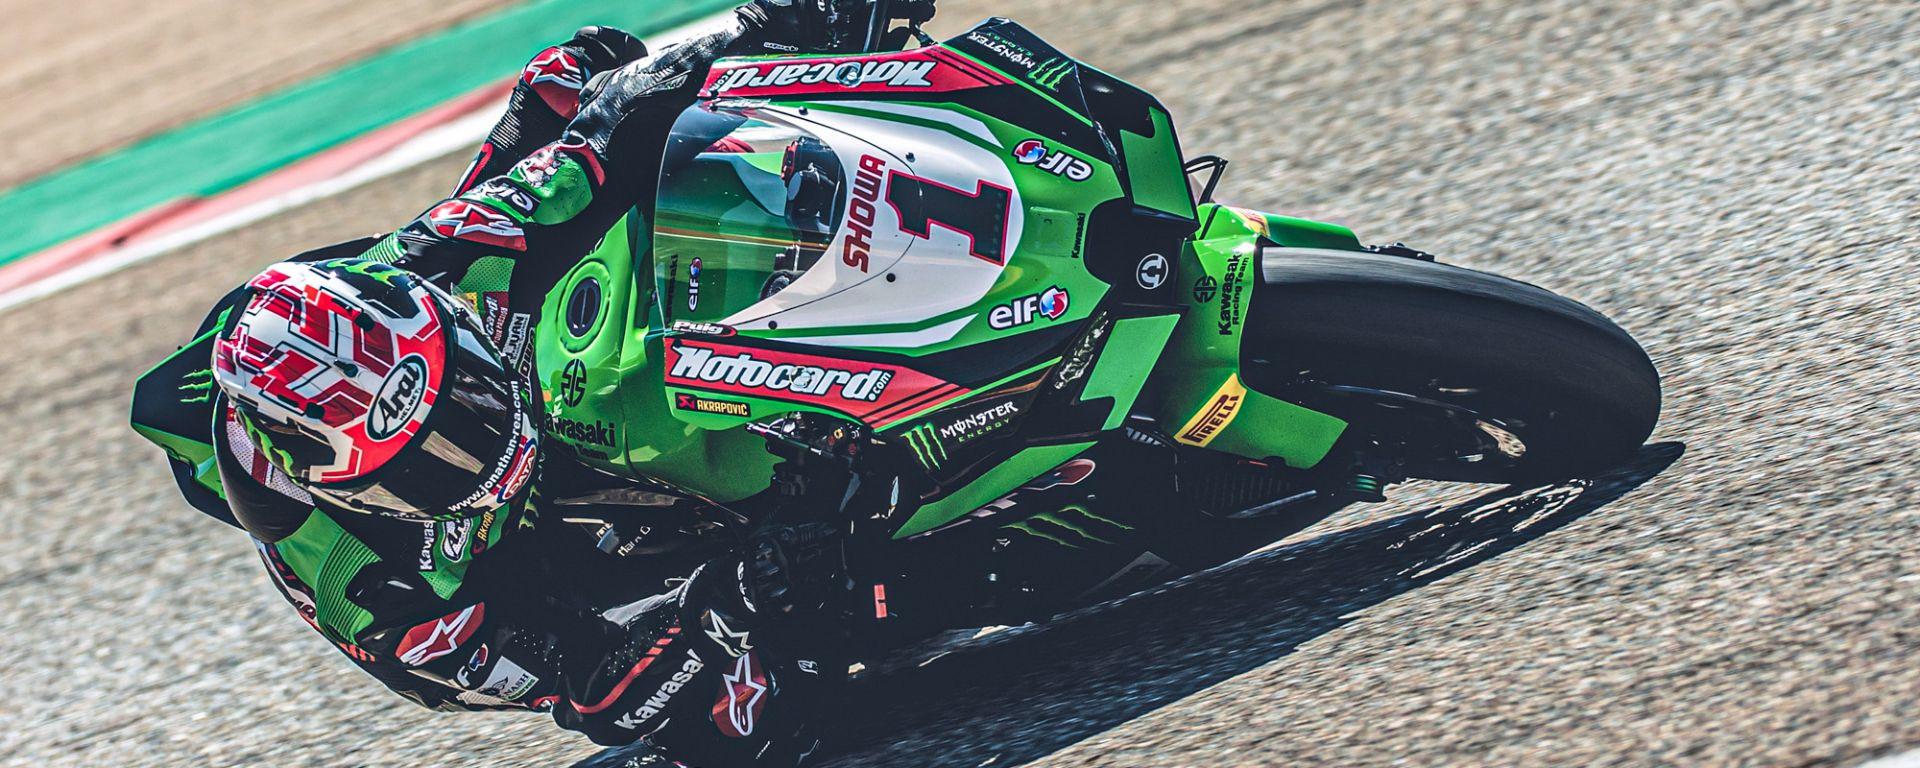 Jonathan Rea (Kawasaki) nei test di Aragon 2021